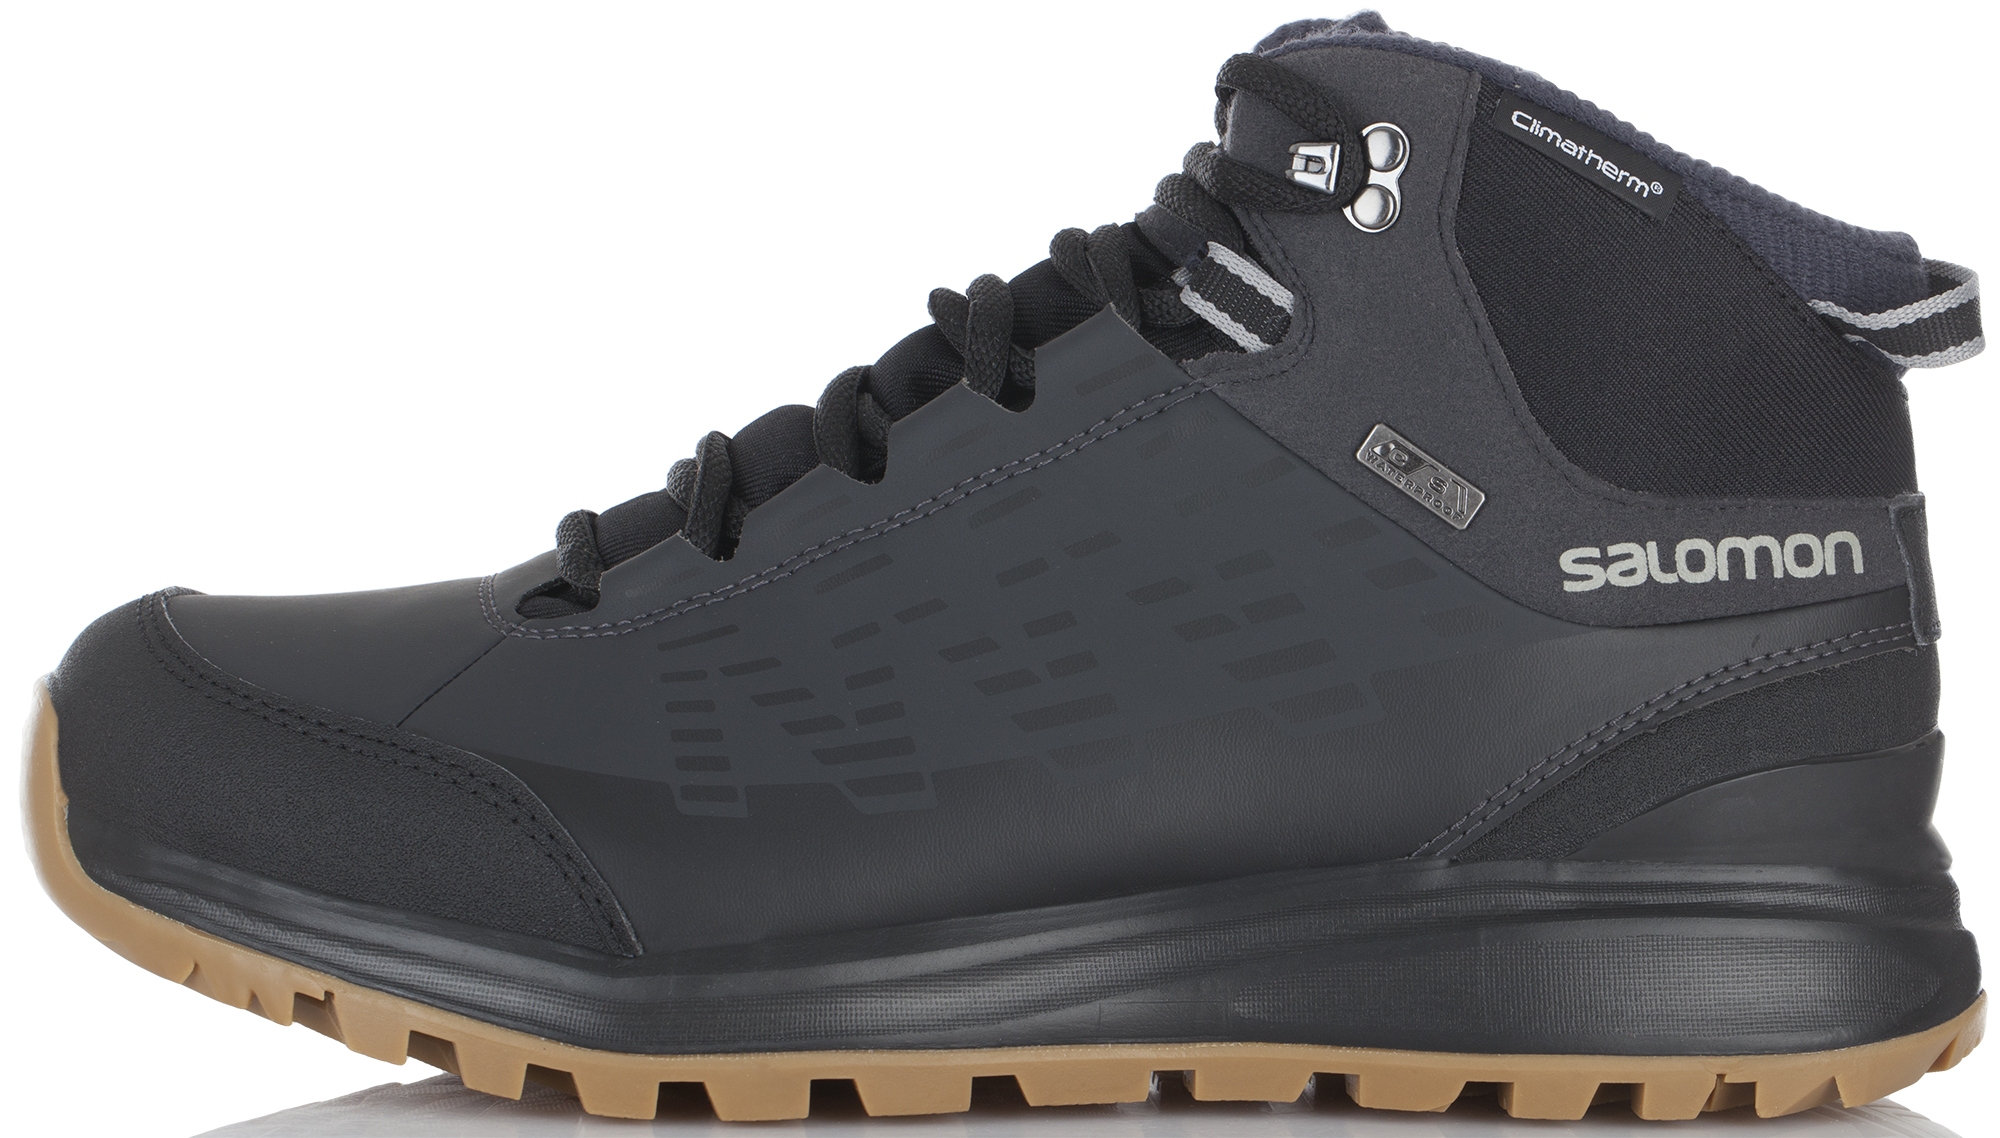 Salomon Ботинки утепленные мужские Salomon, размер 40 salomon ботинки утепленные мужские salomon crusano размер 40